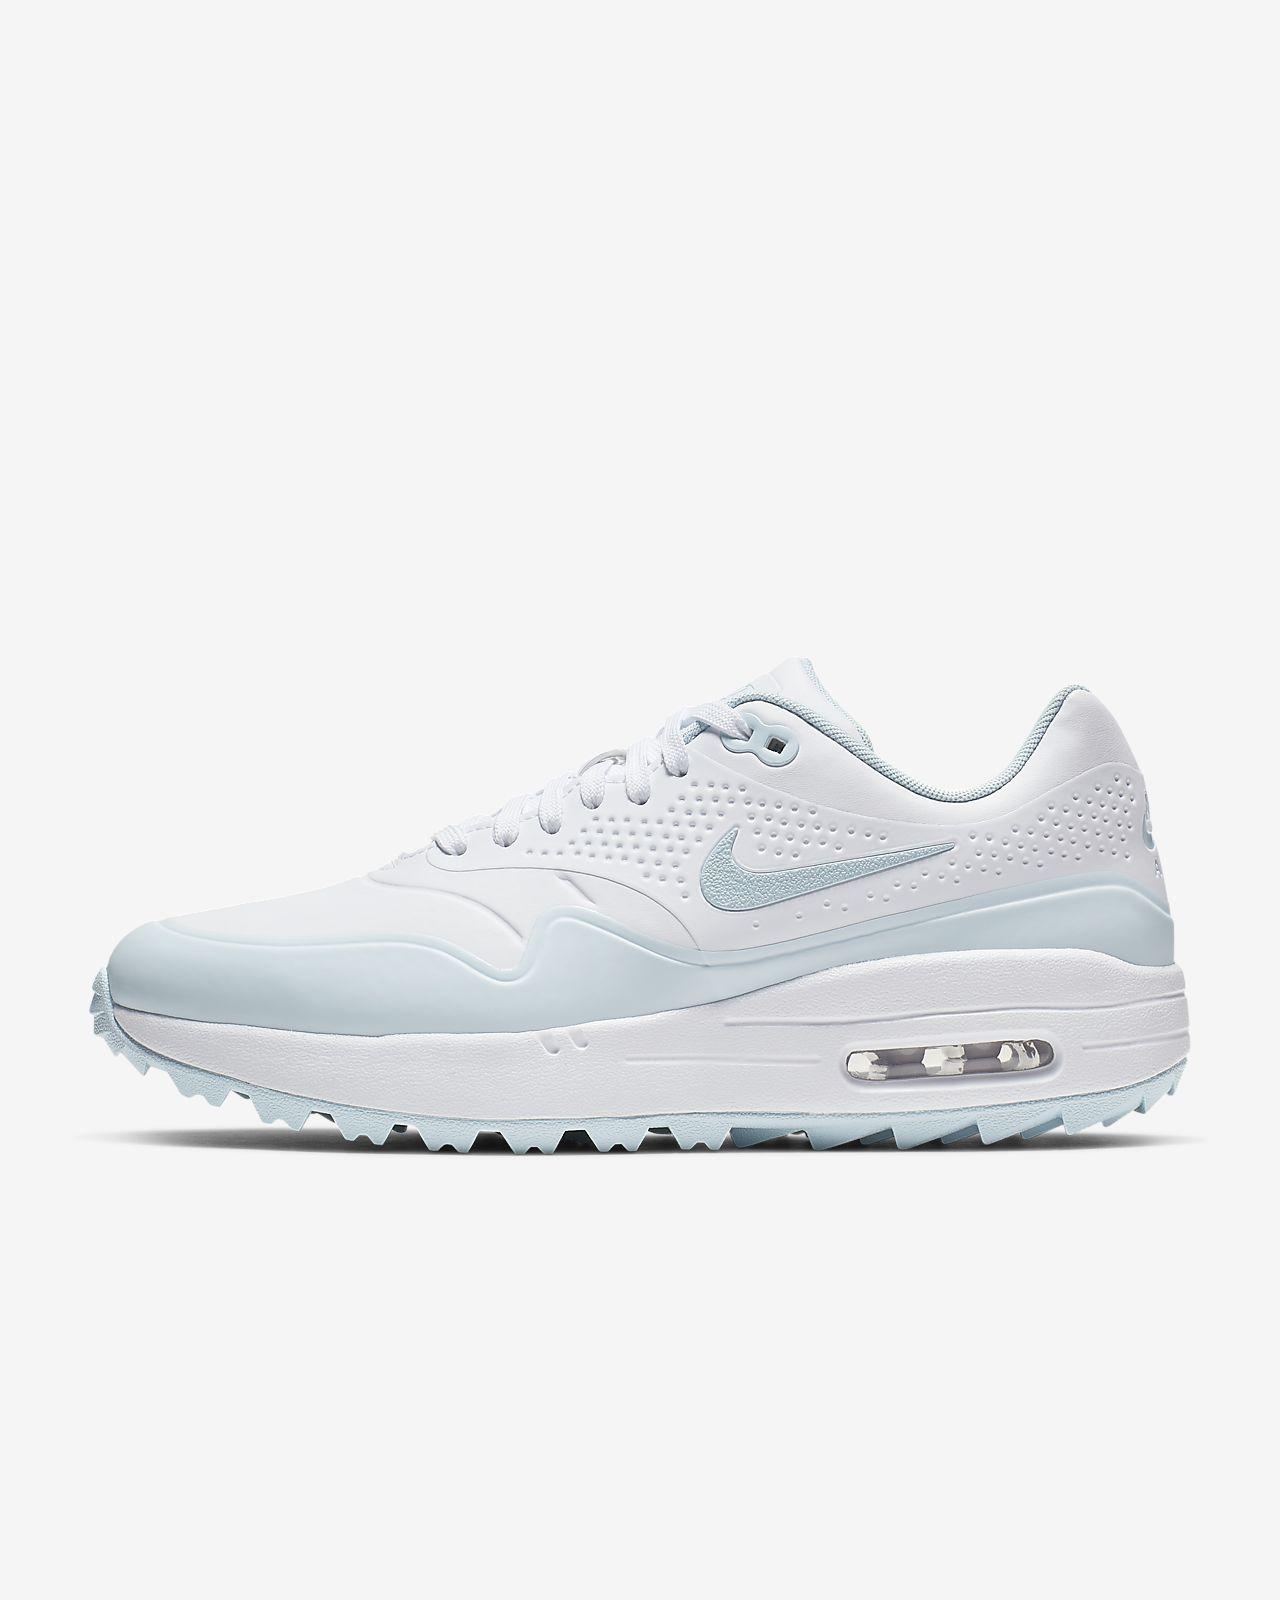 Dámská golfová bota Nike Air Max 1 G